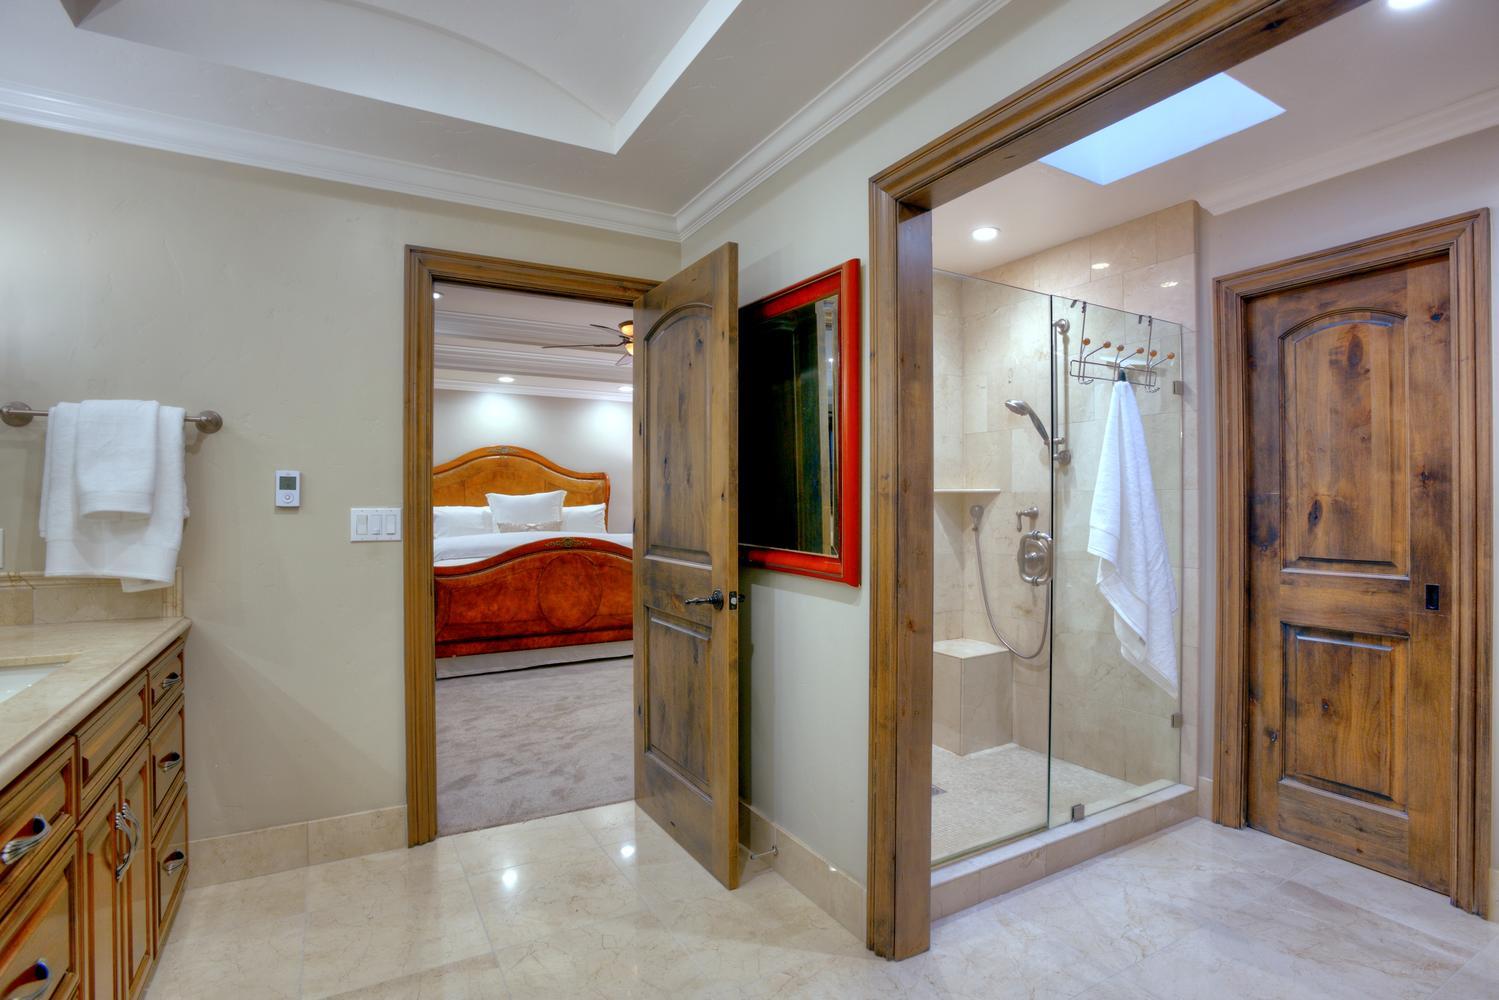 15977 Grandview Dr Monte-large-040-36-Maste Bedroom Bathroom View-1500x1000-72dpi.jpg